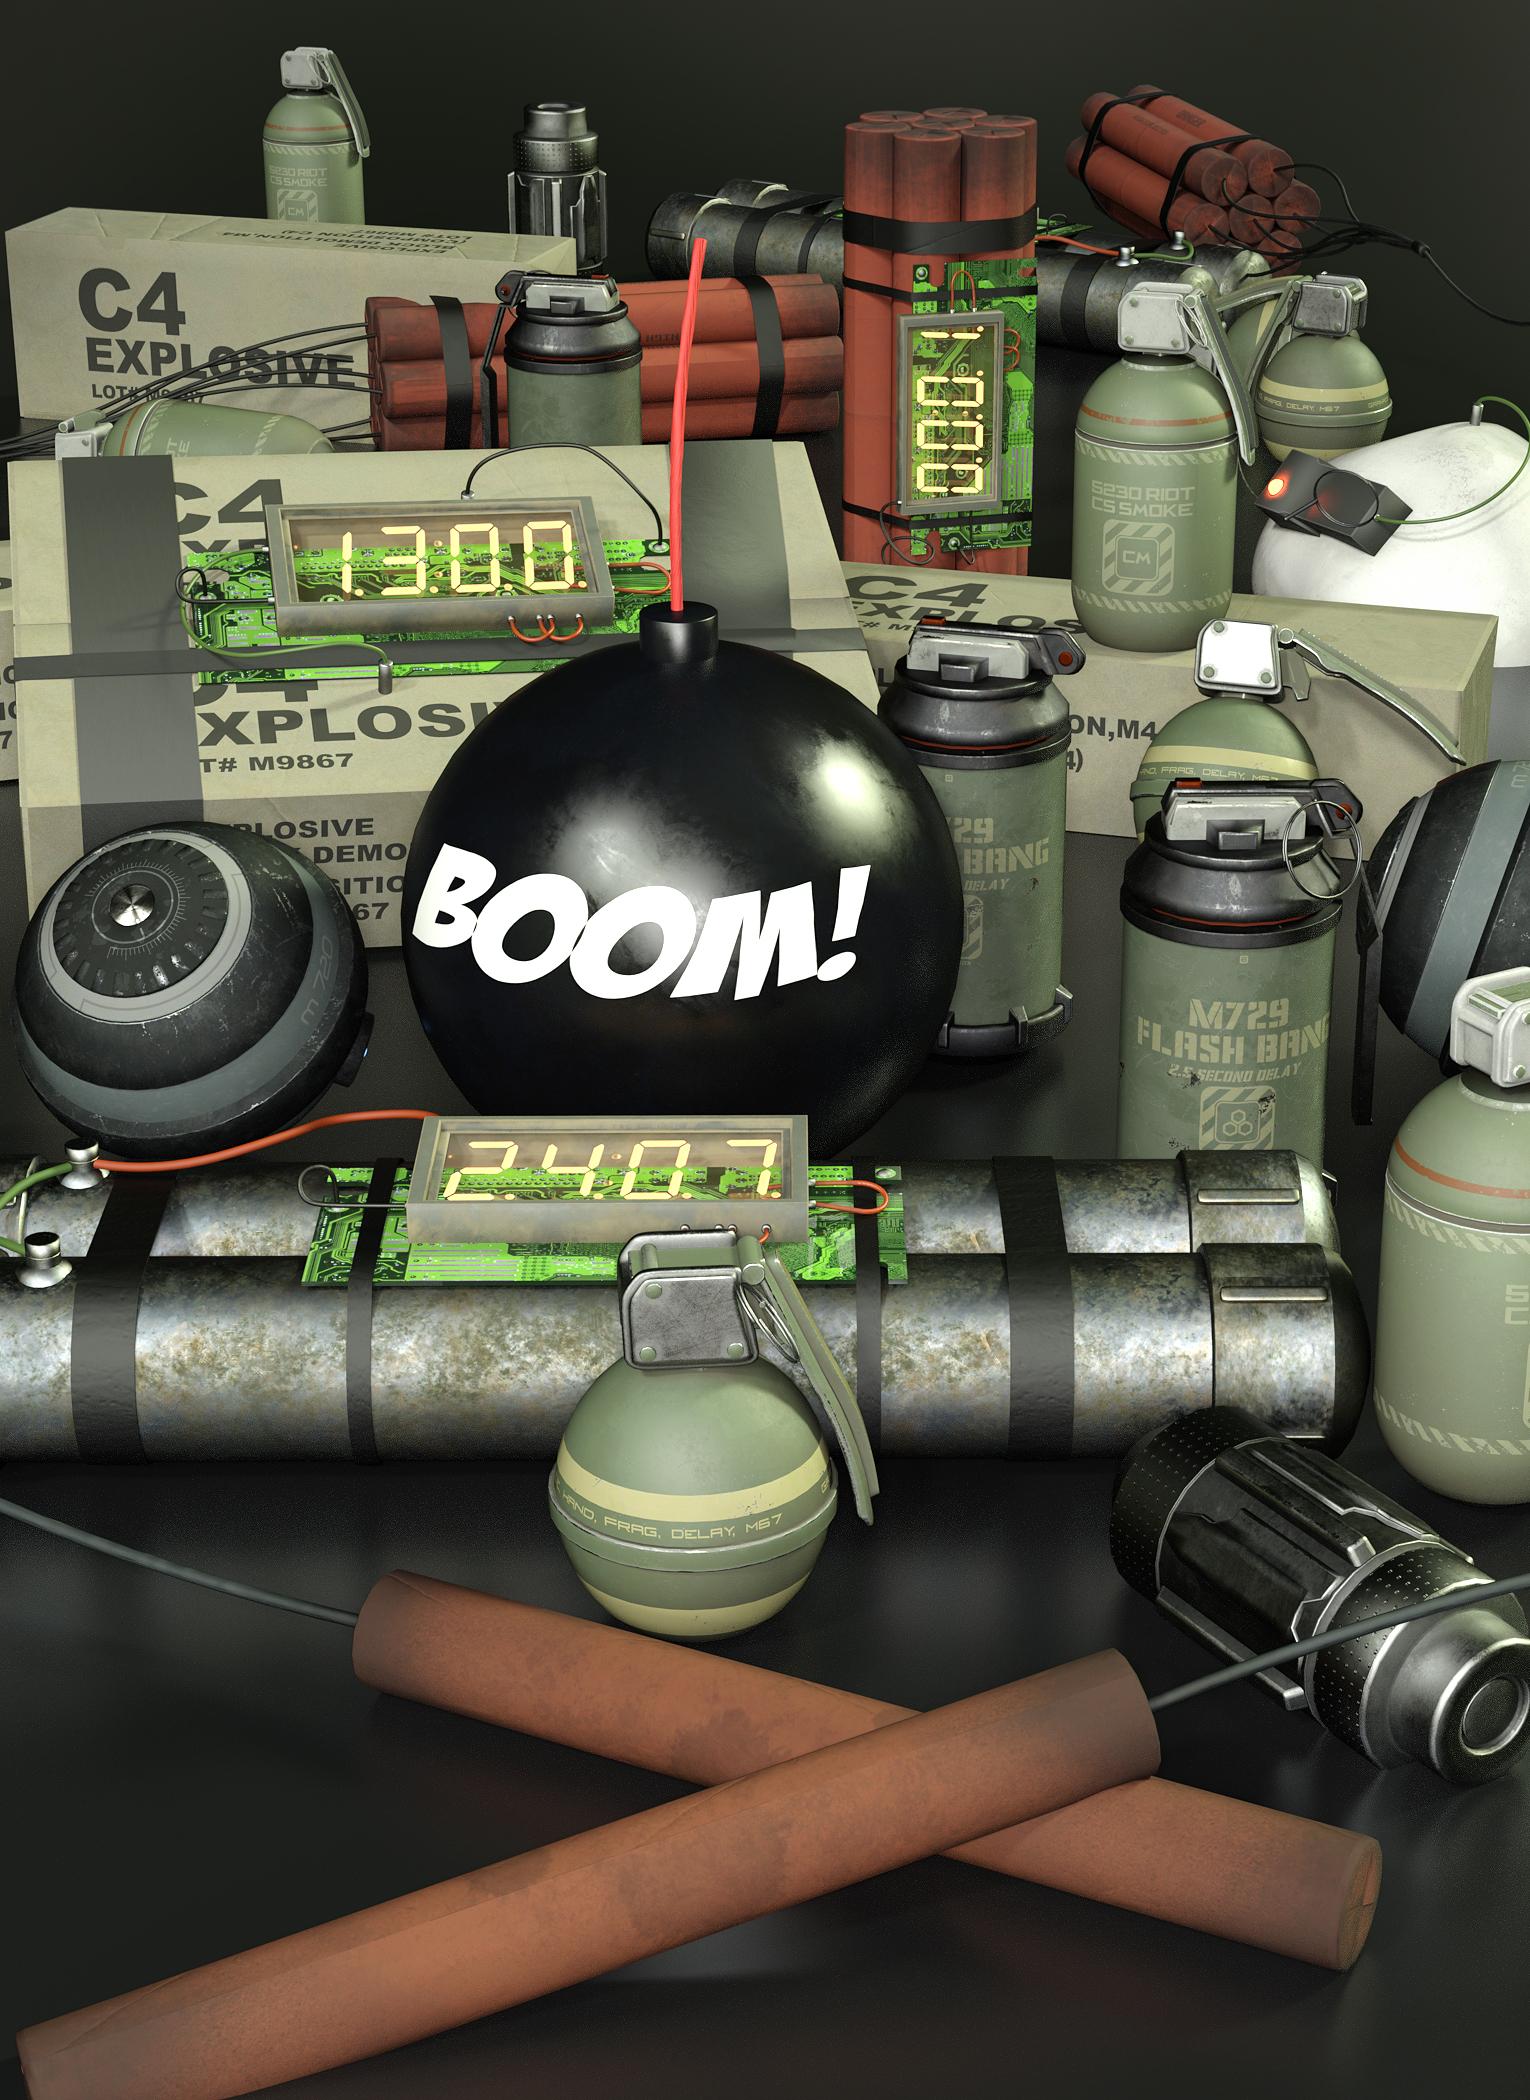 Explosive Props by: The AntFarm, 3D Models by Daz 3D